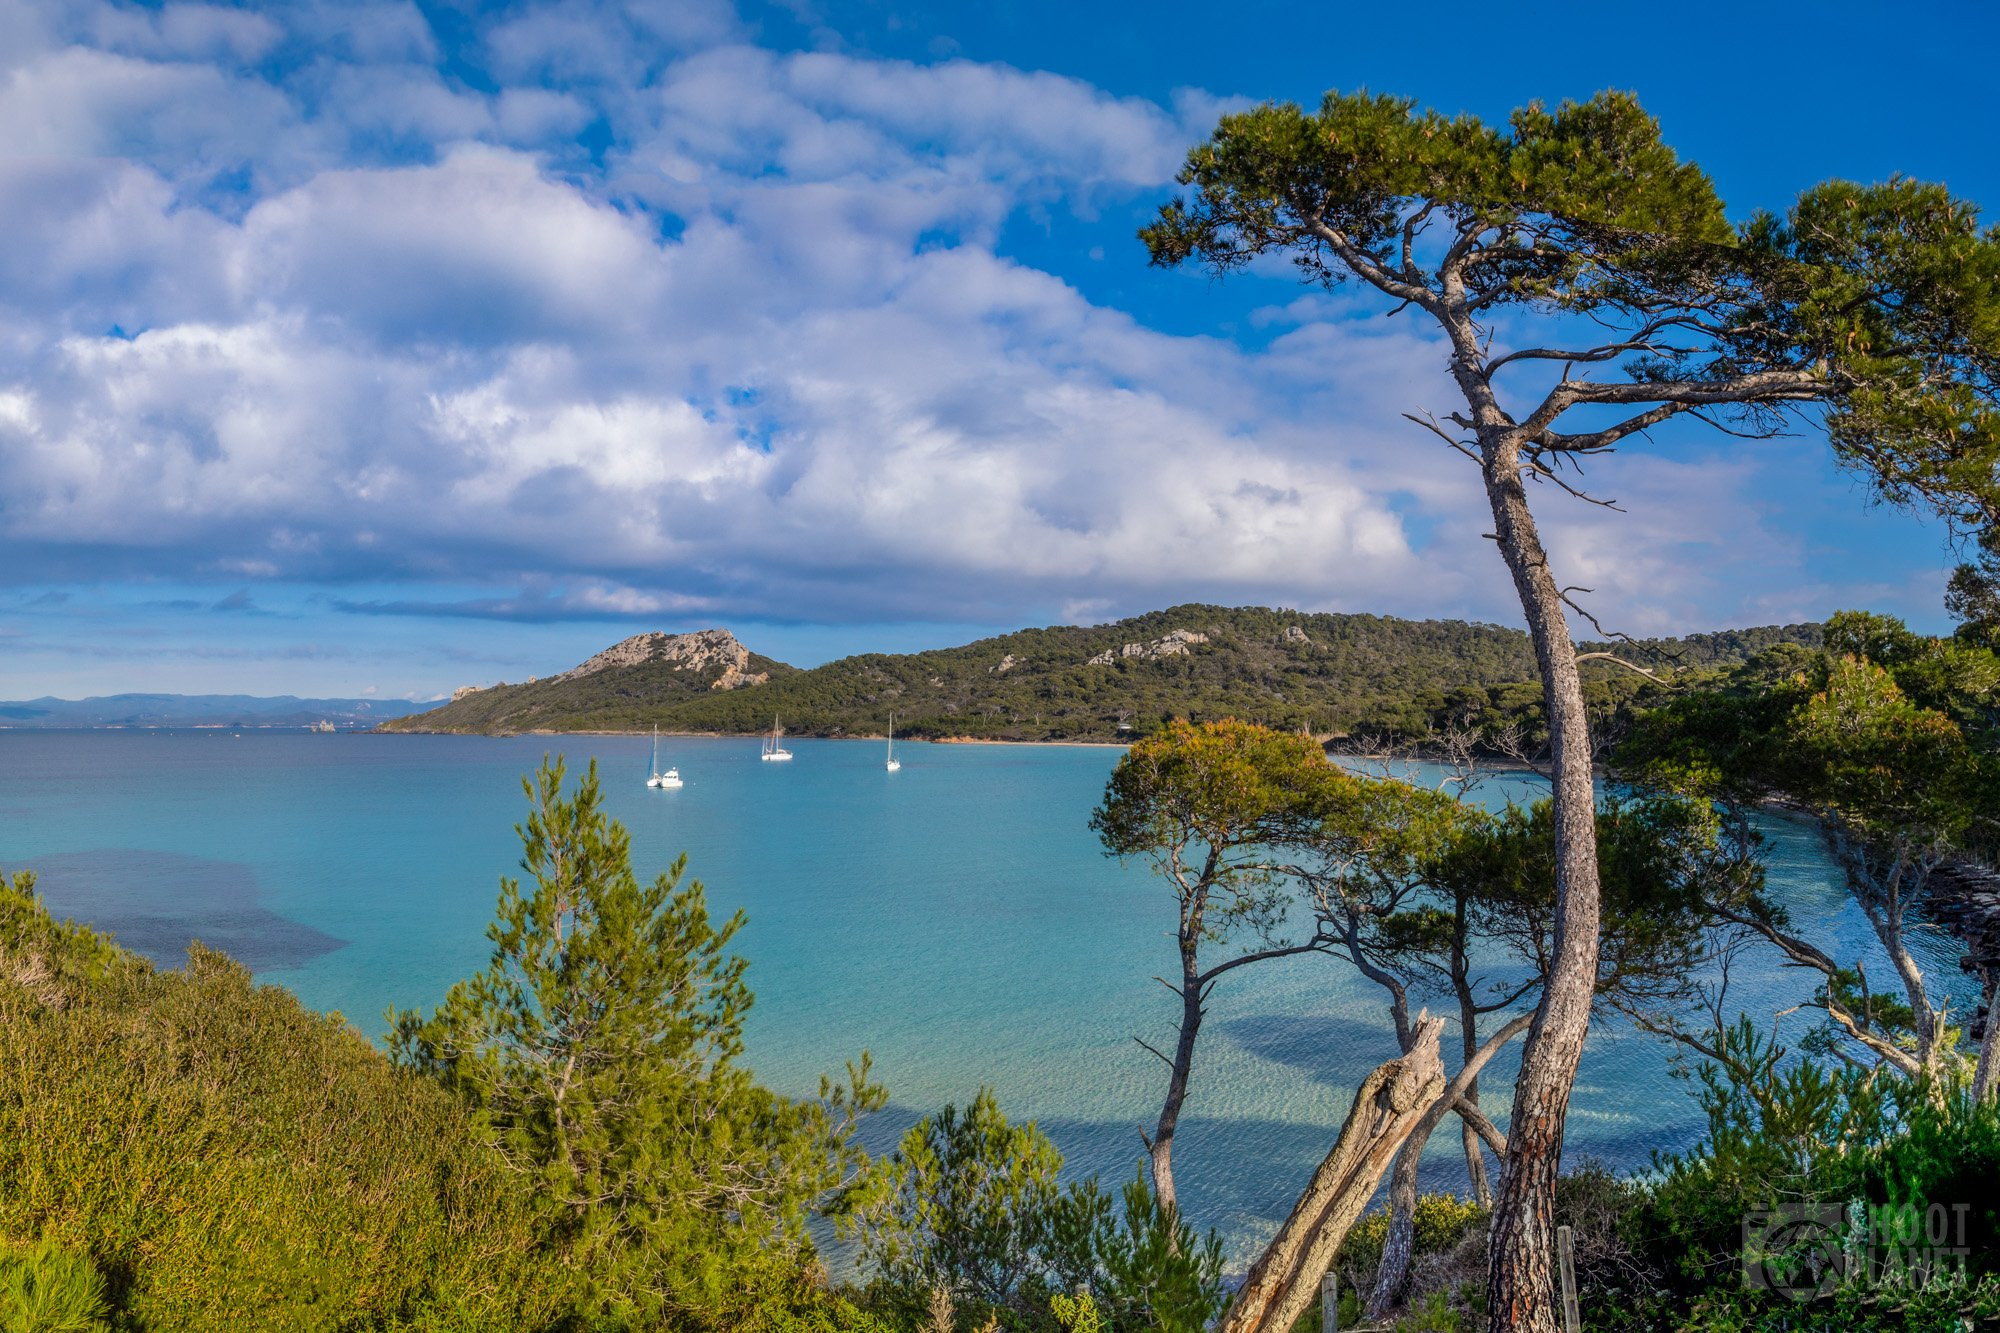 Notre-Dame beach, Porquerolles, Azure coast France